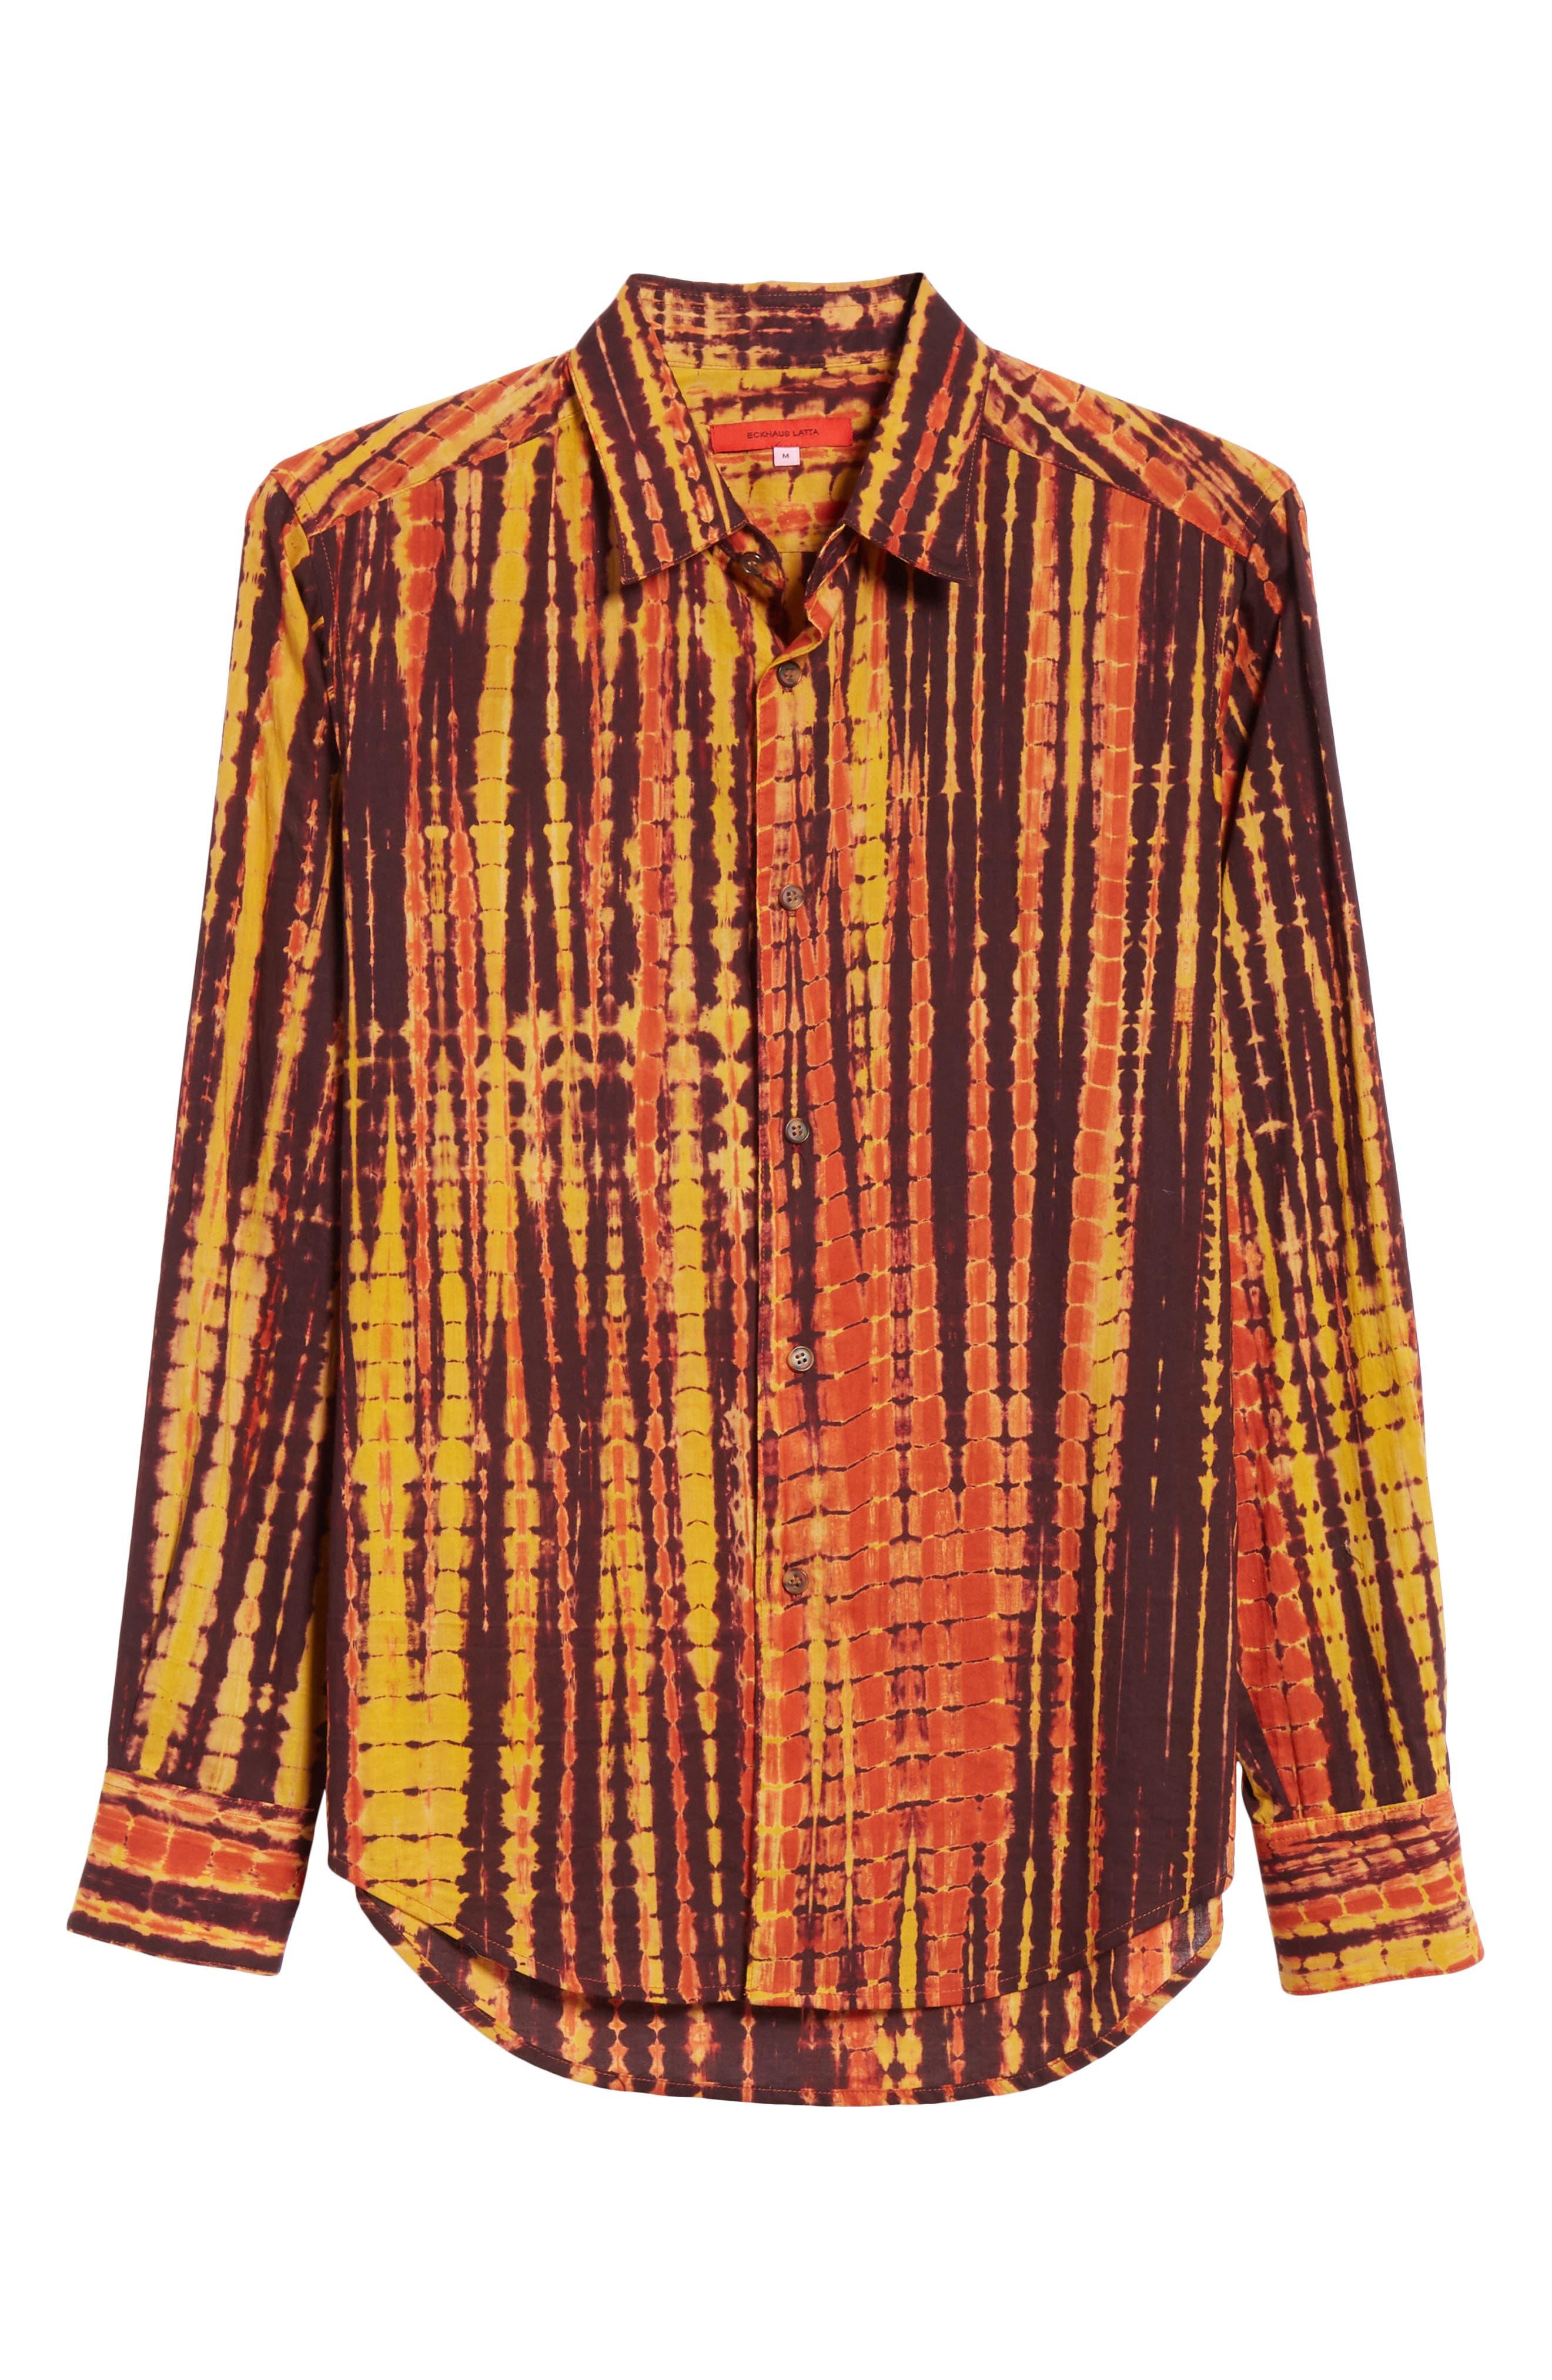 ECKHAUS LATTA,                             Hand Dyed Cotton Shirt,                             Alternate thumbnail 6, color,                             200